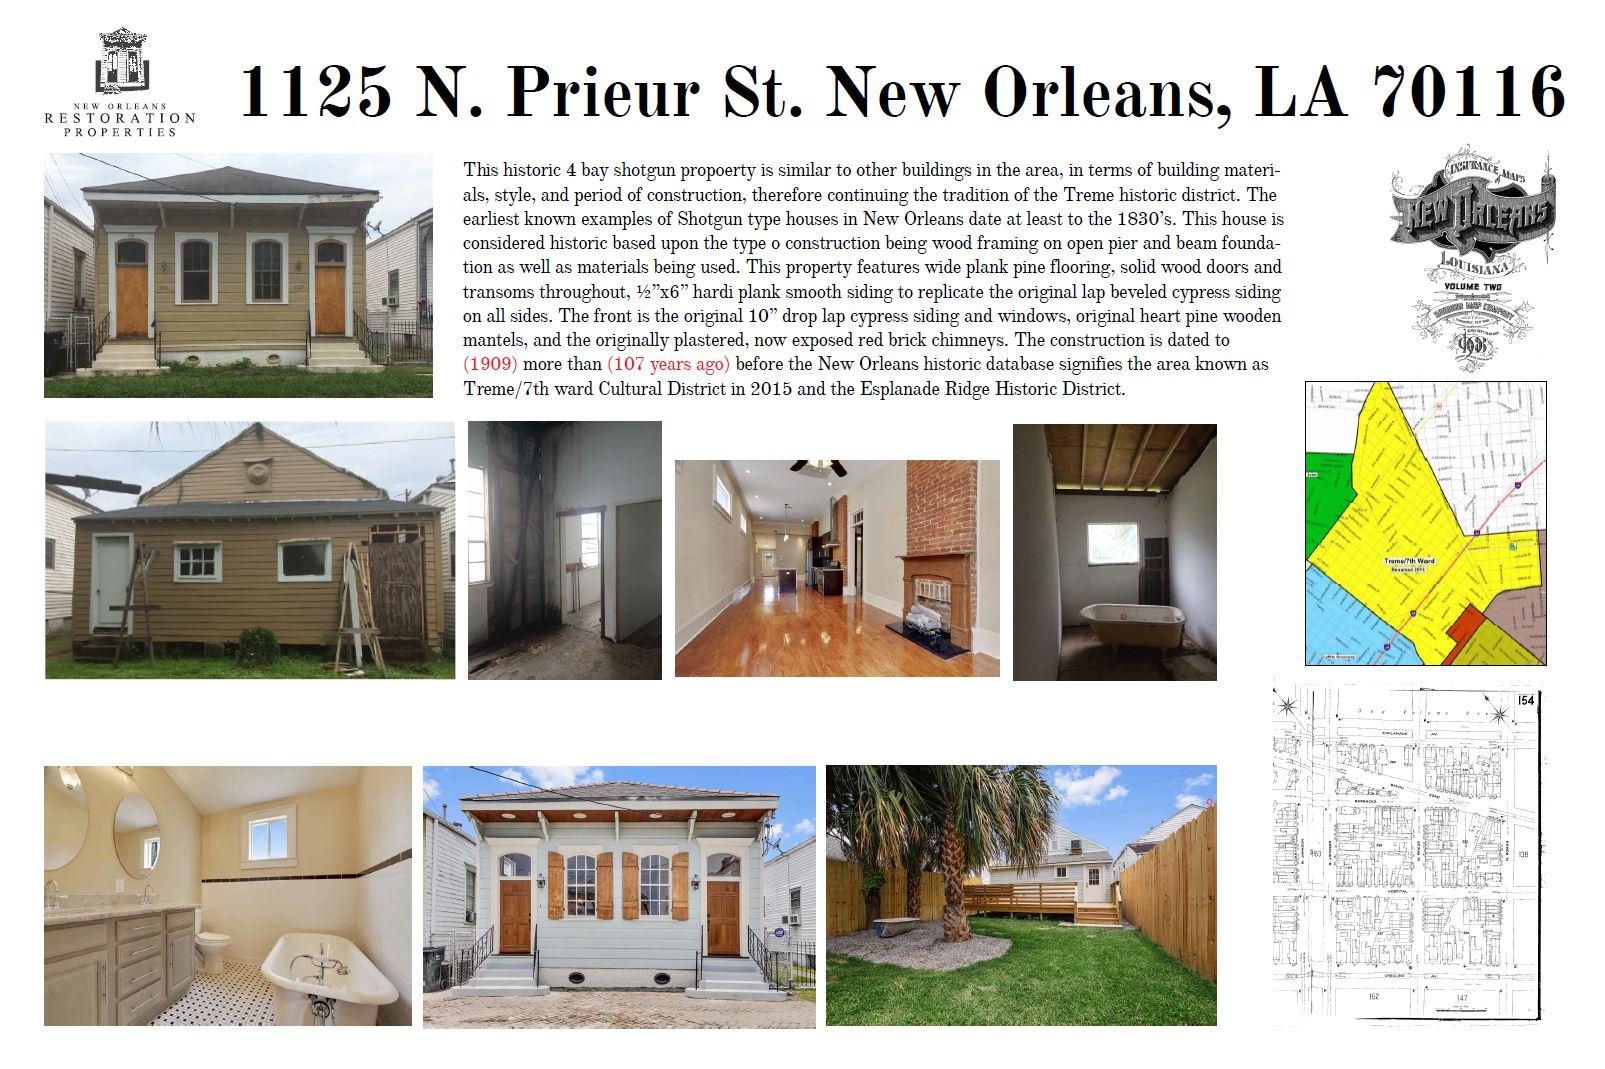 1125 N Prieur St Property Restoration